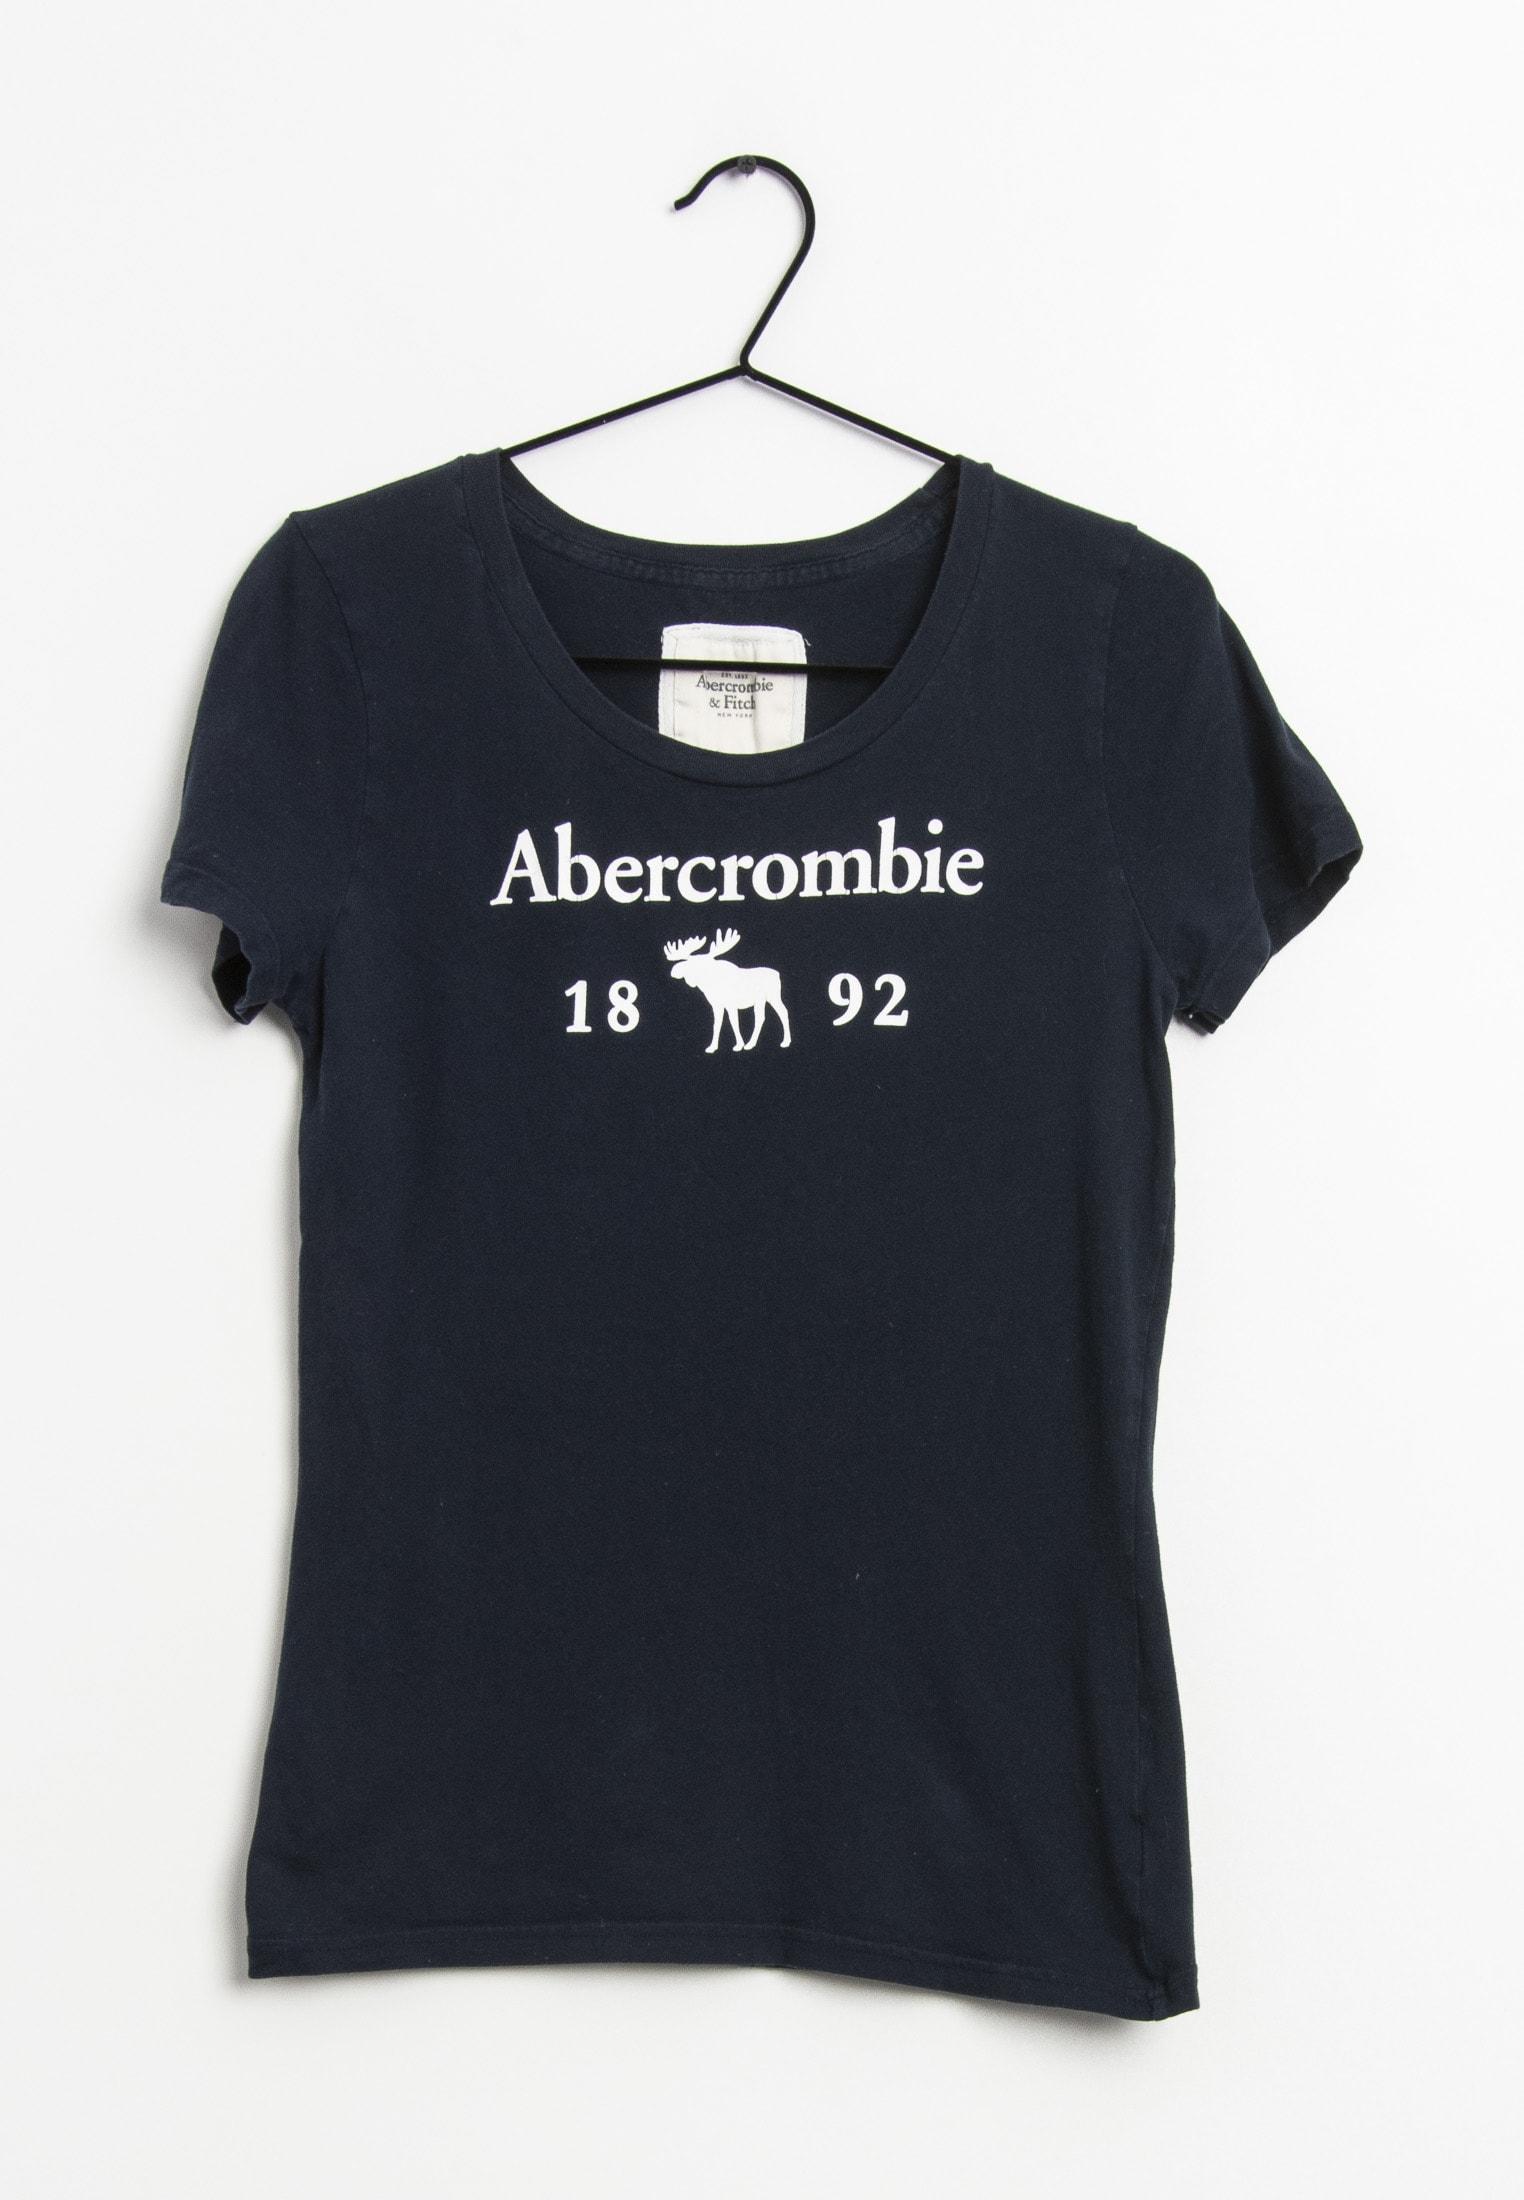 Abercrombie & Fitch T-Shirt Blau Gr.L